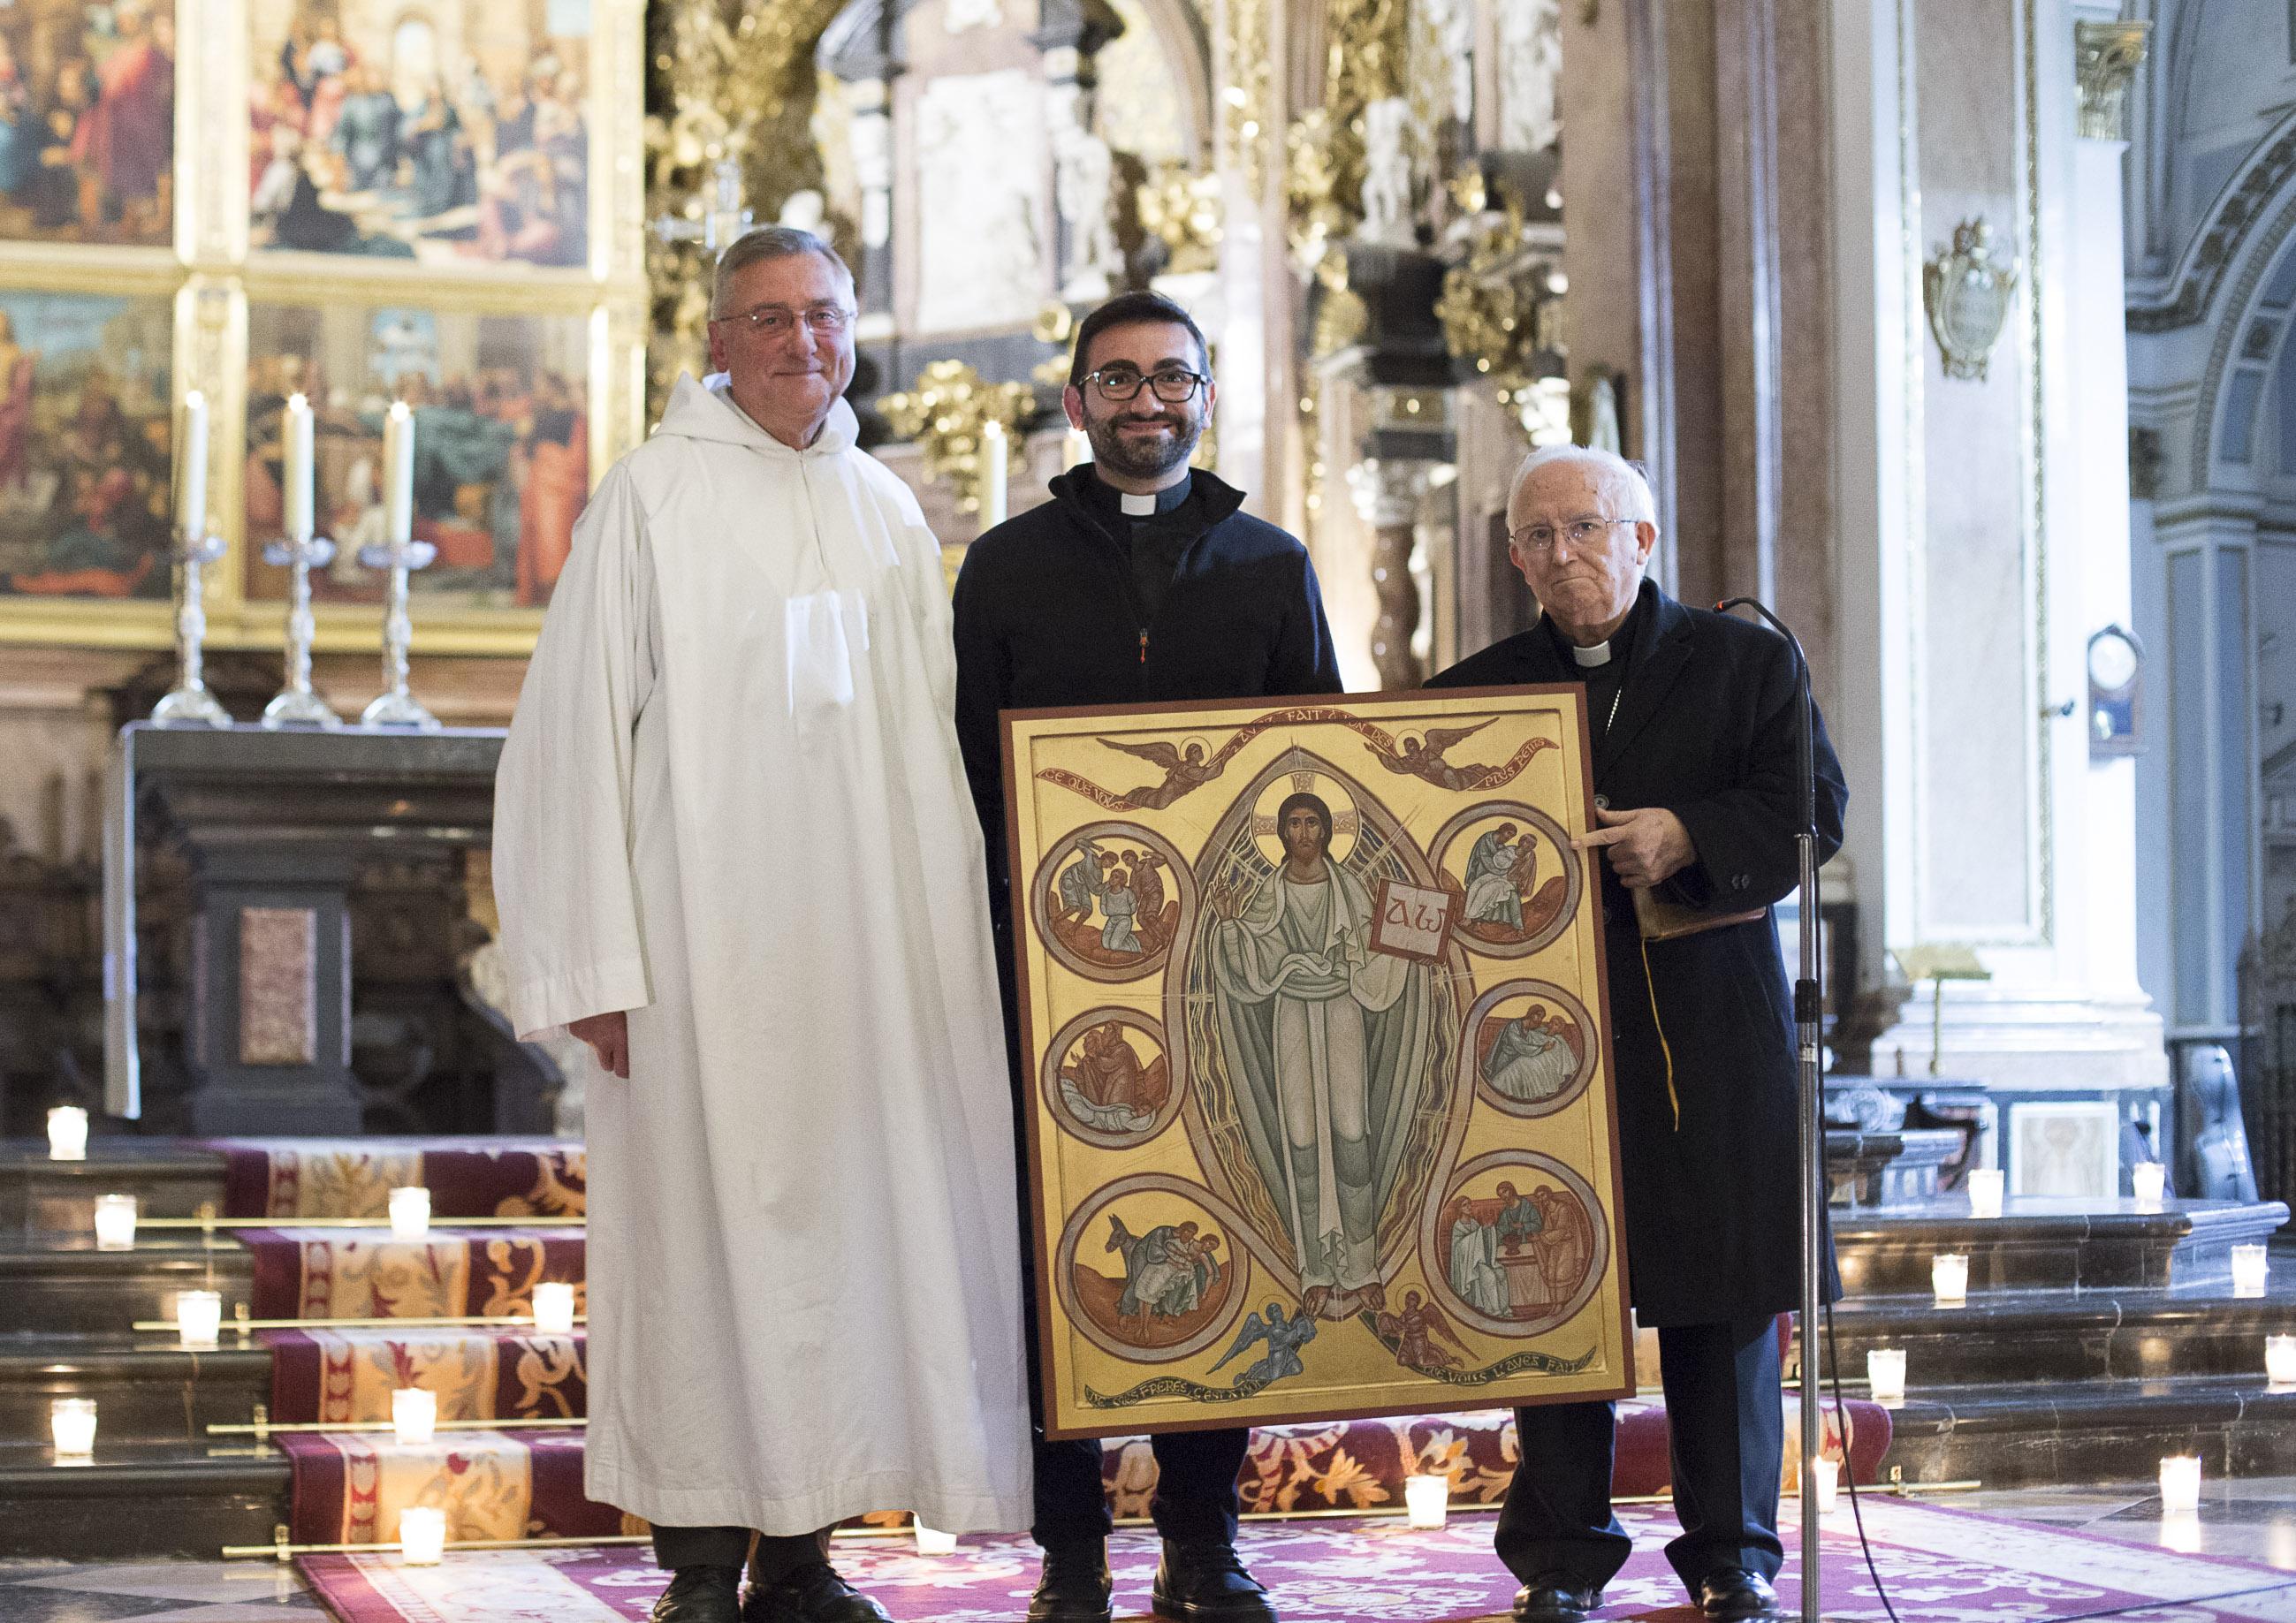 Taizé cede a Valencia su icono de la Misericordia